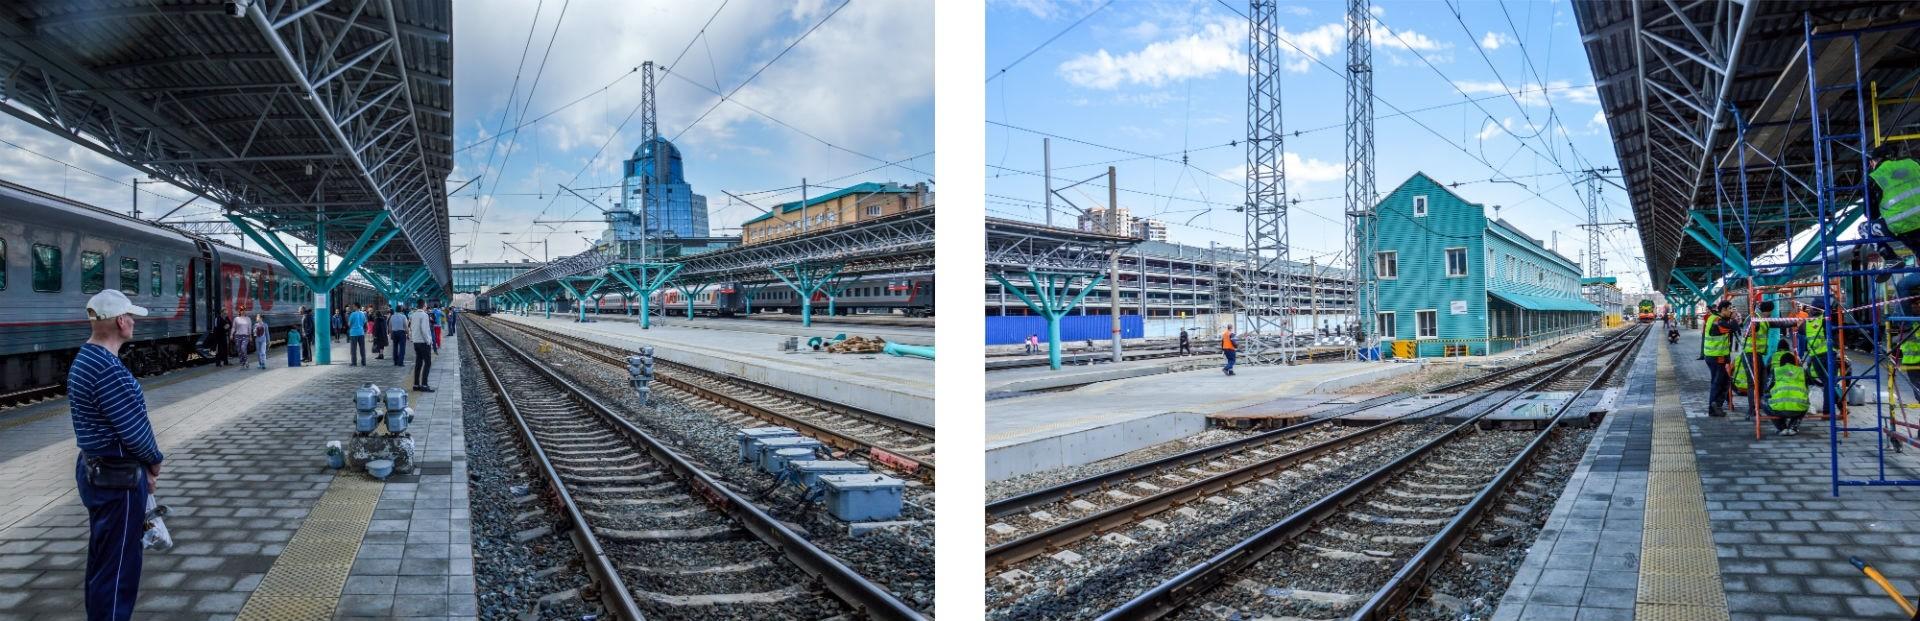 Pause en gare de Samara.